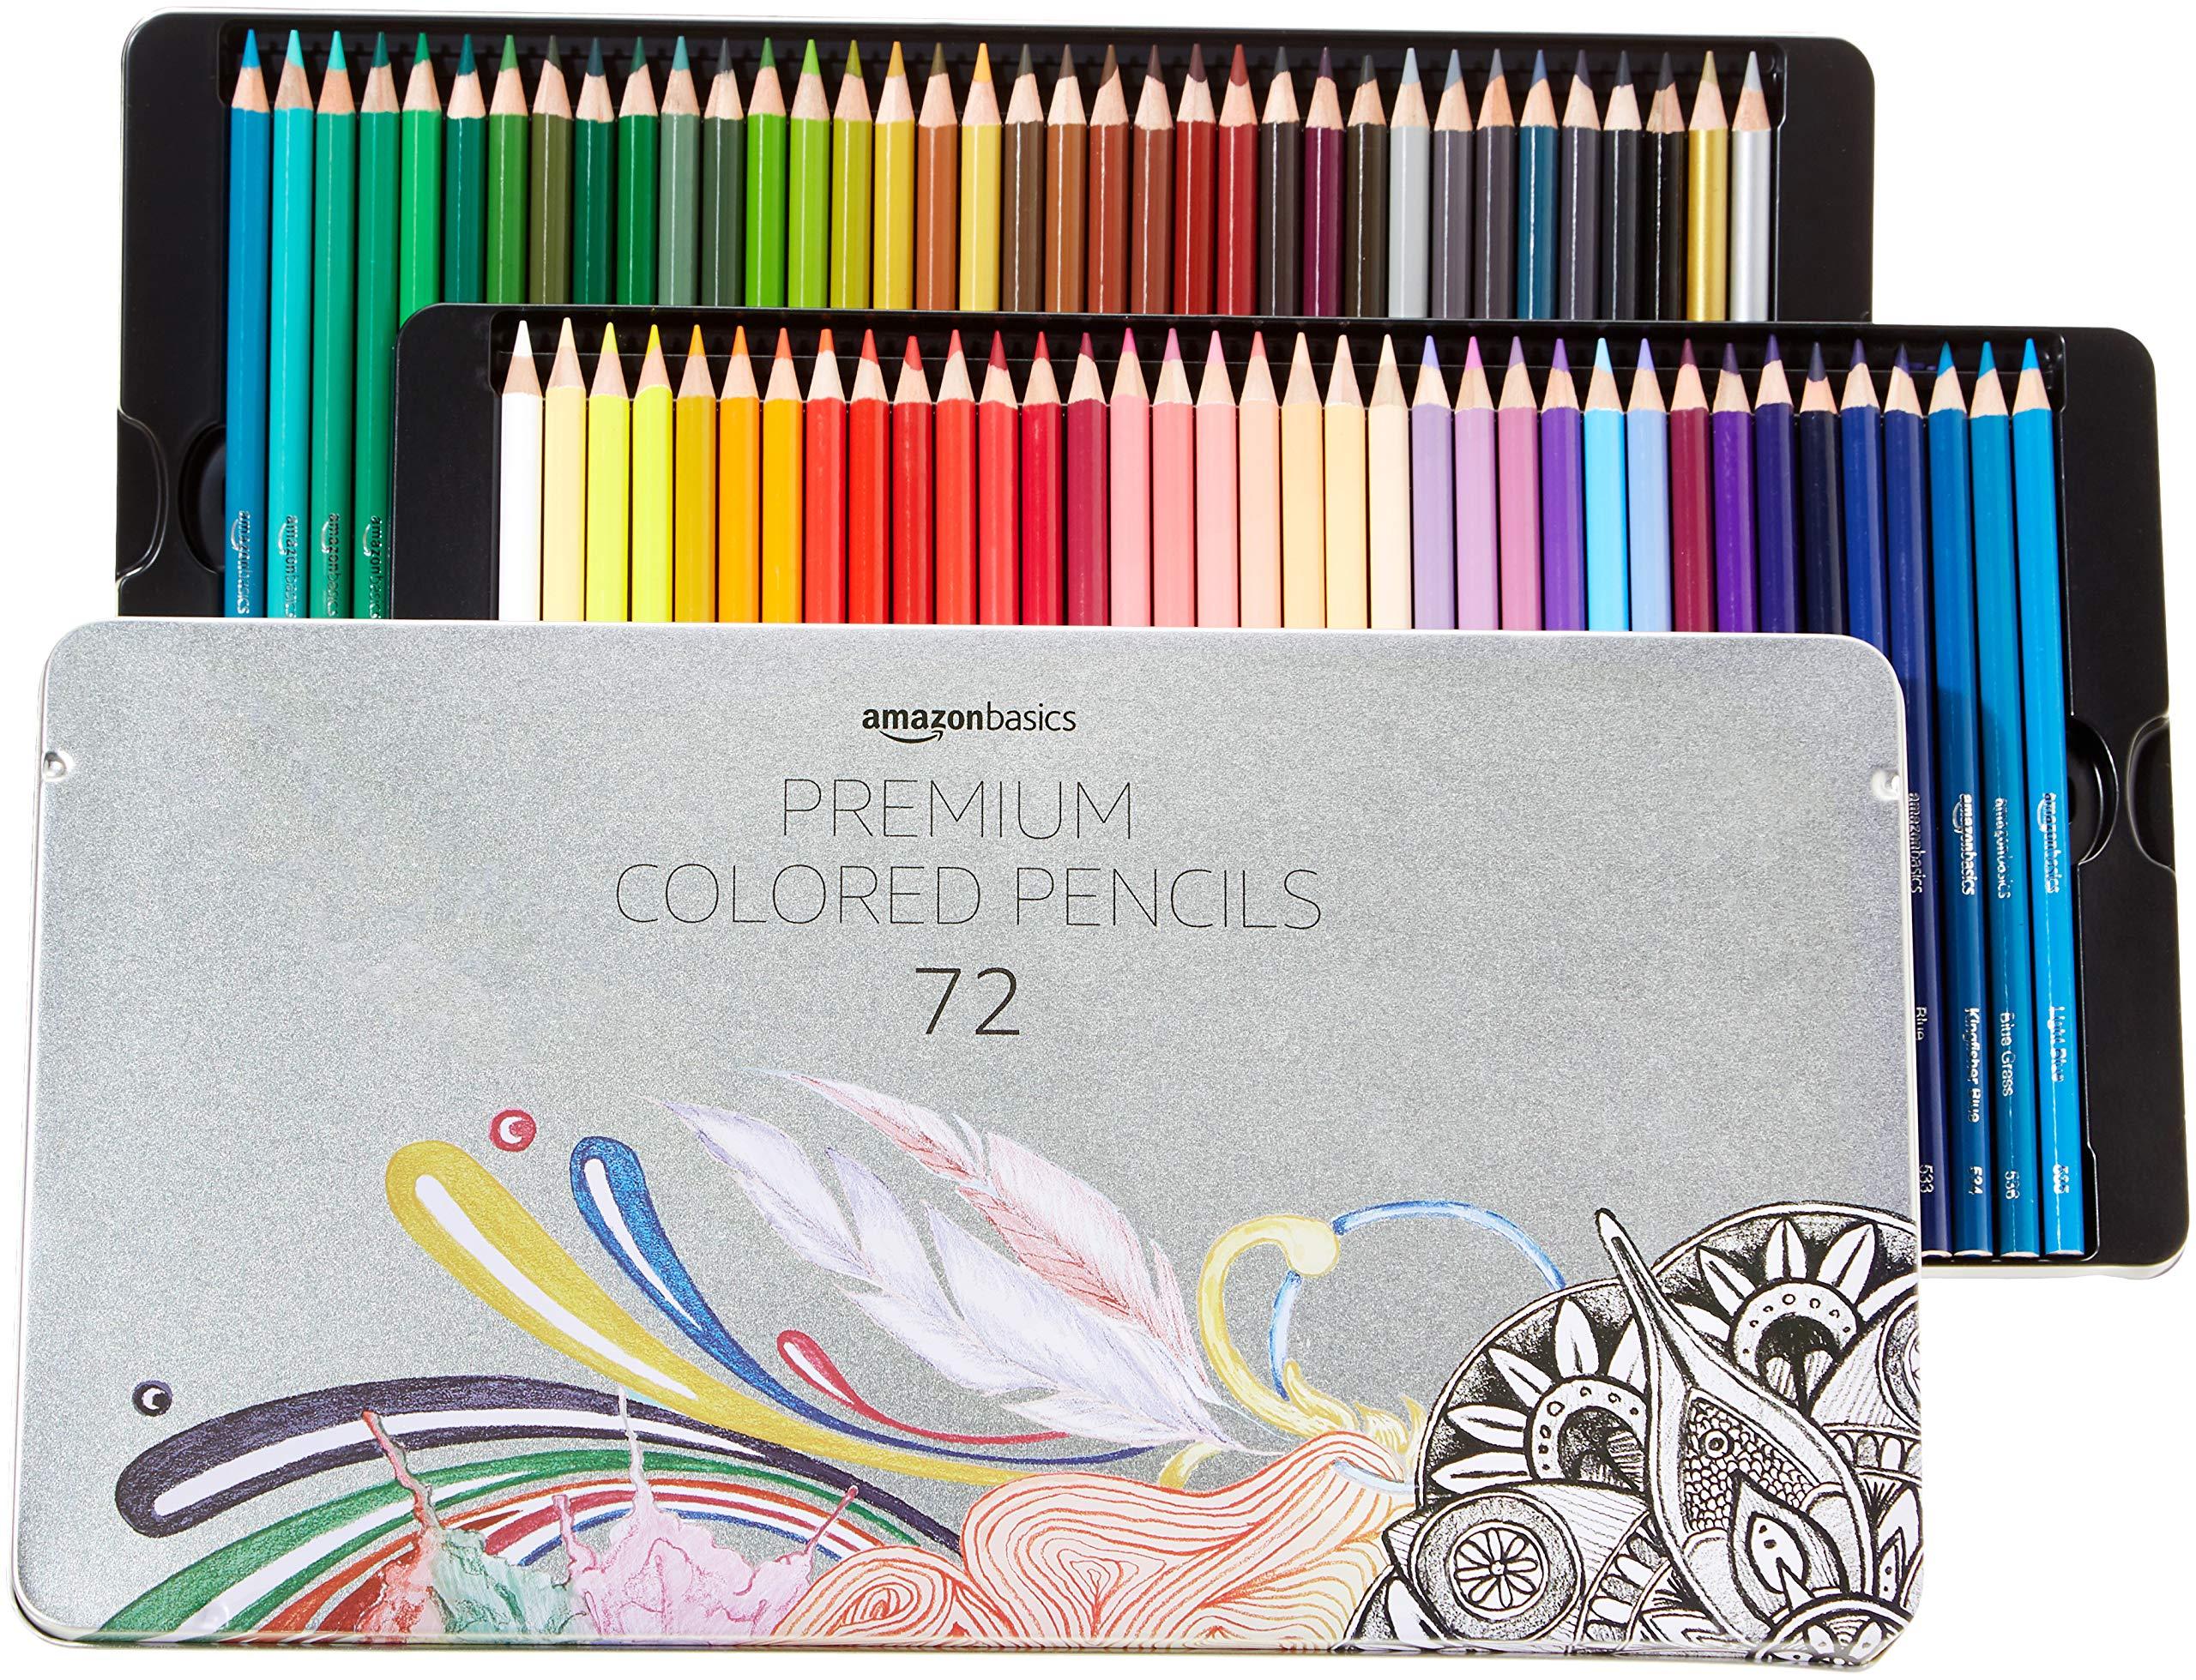 AmazonBasics Colored Pencils - 72-Count Set by AmazonBasics